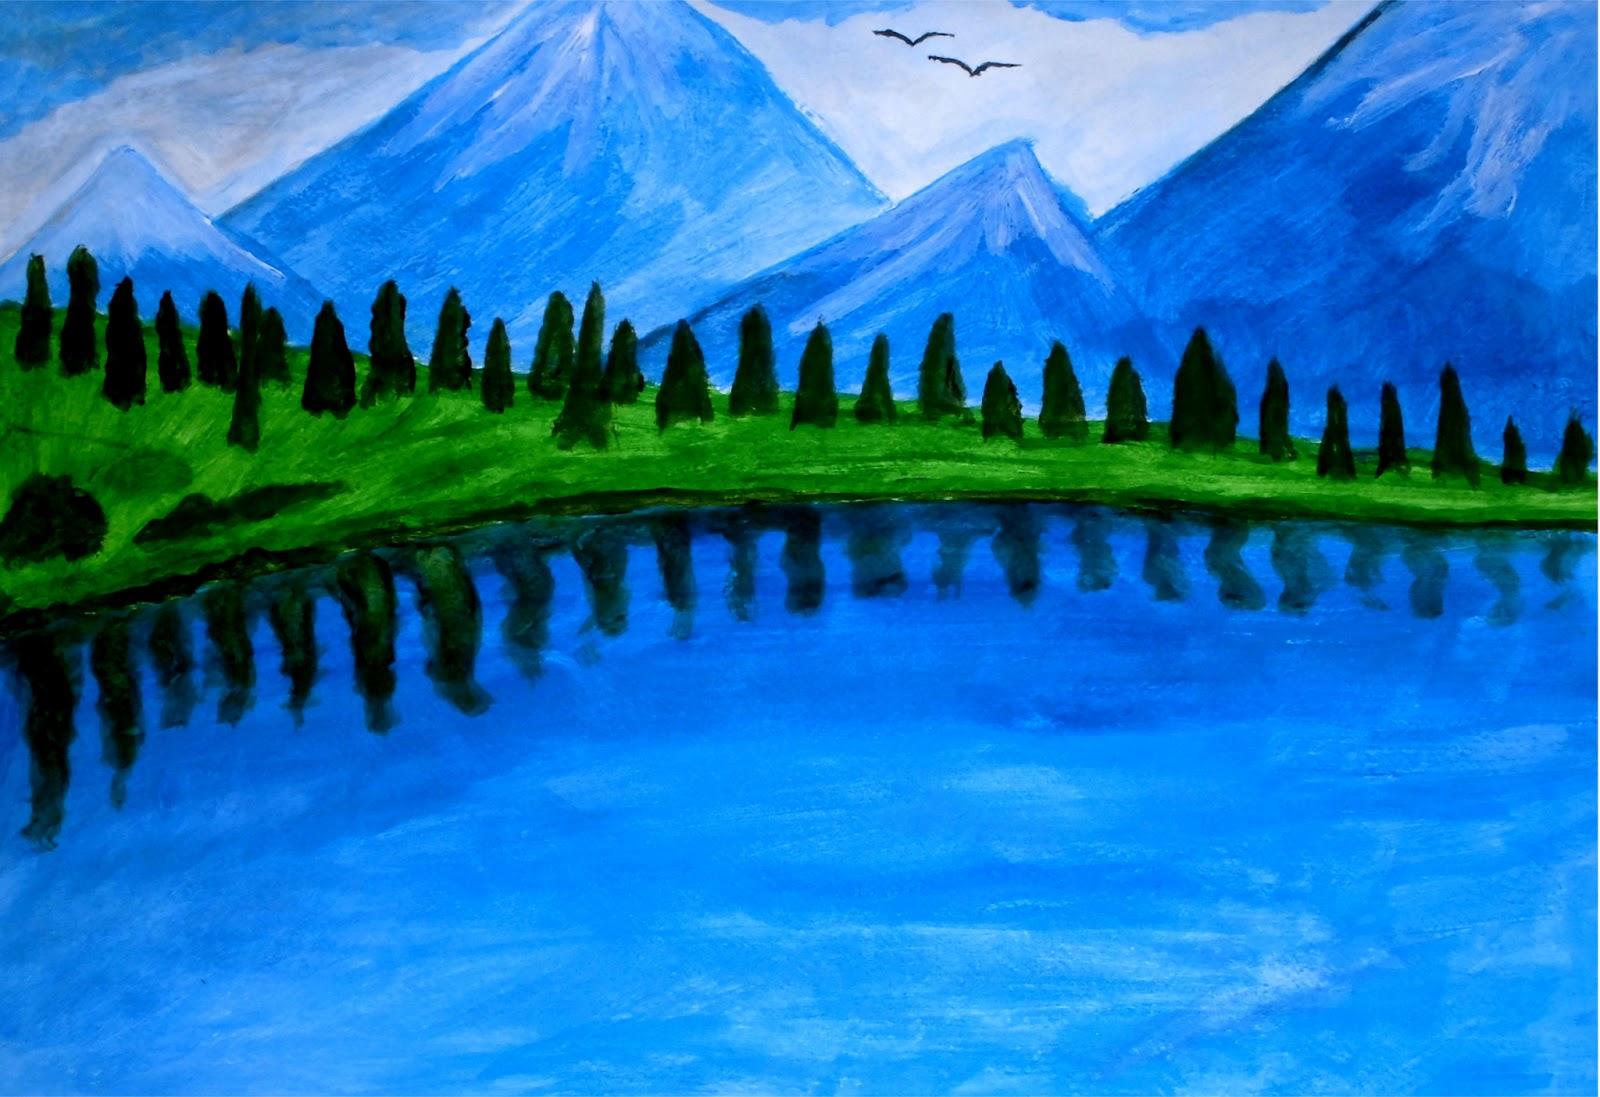 Im genes de paisajes f ciles de hacer imagui - Paisajes nevados para pintar ...